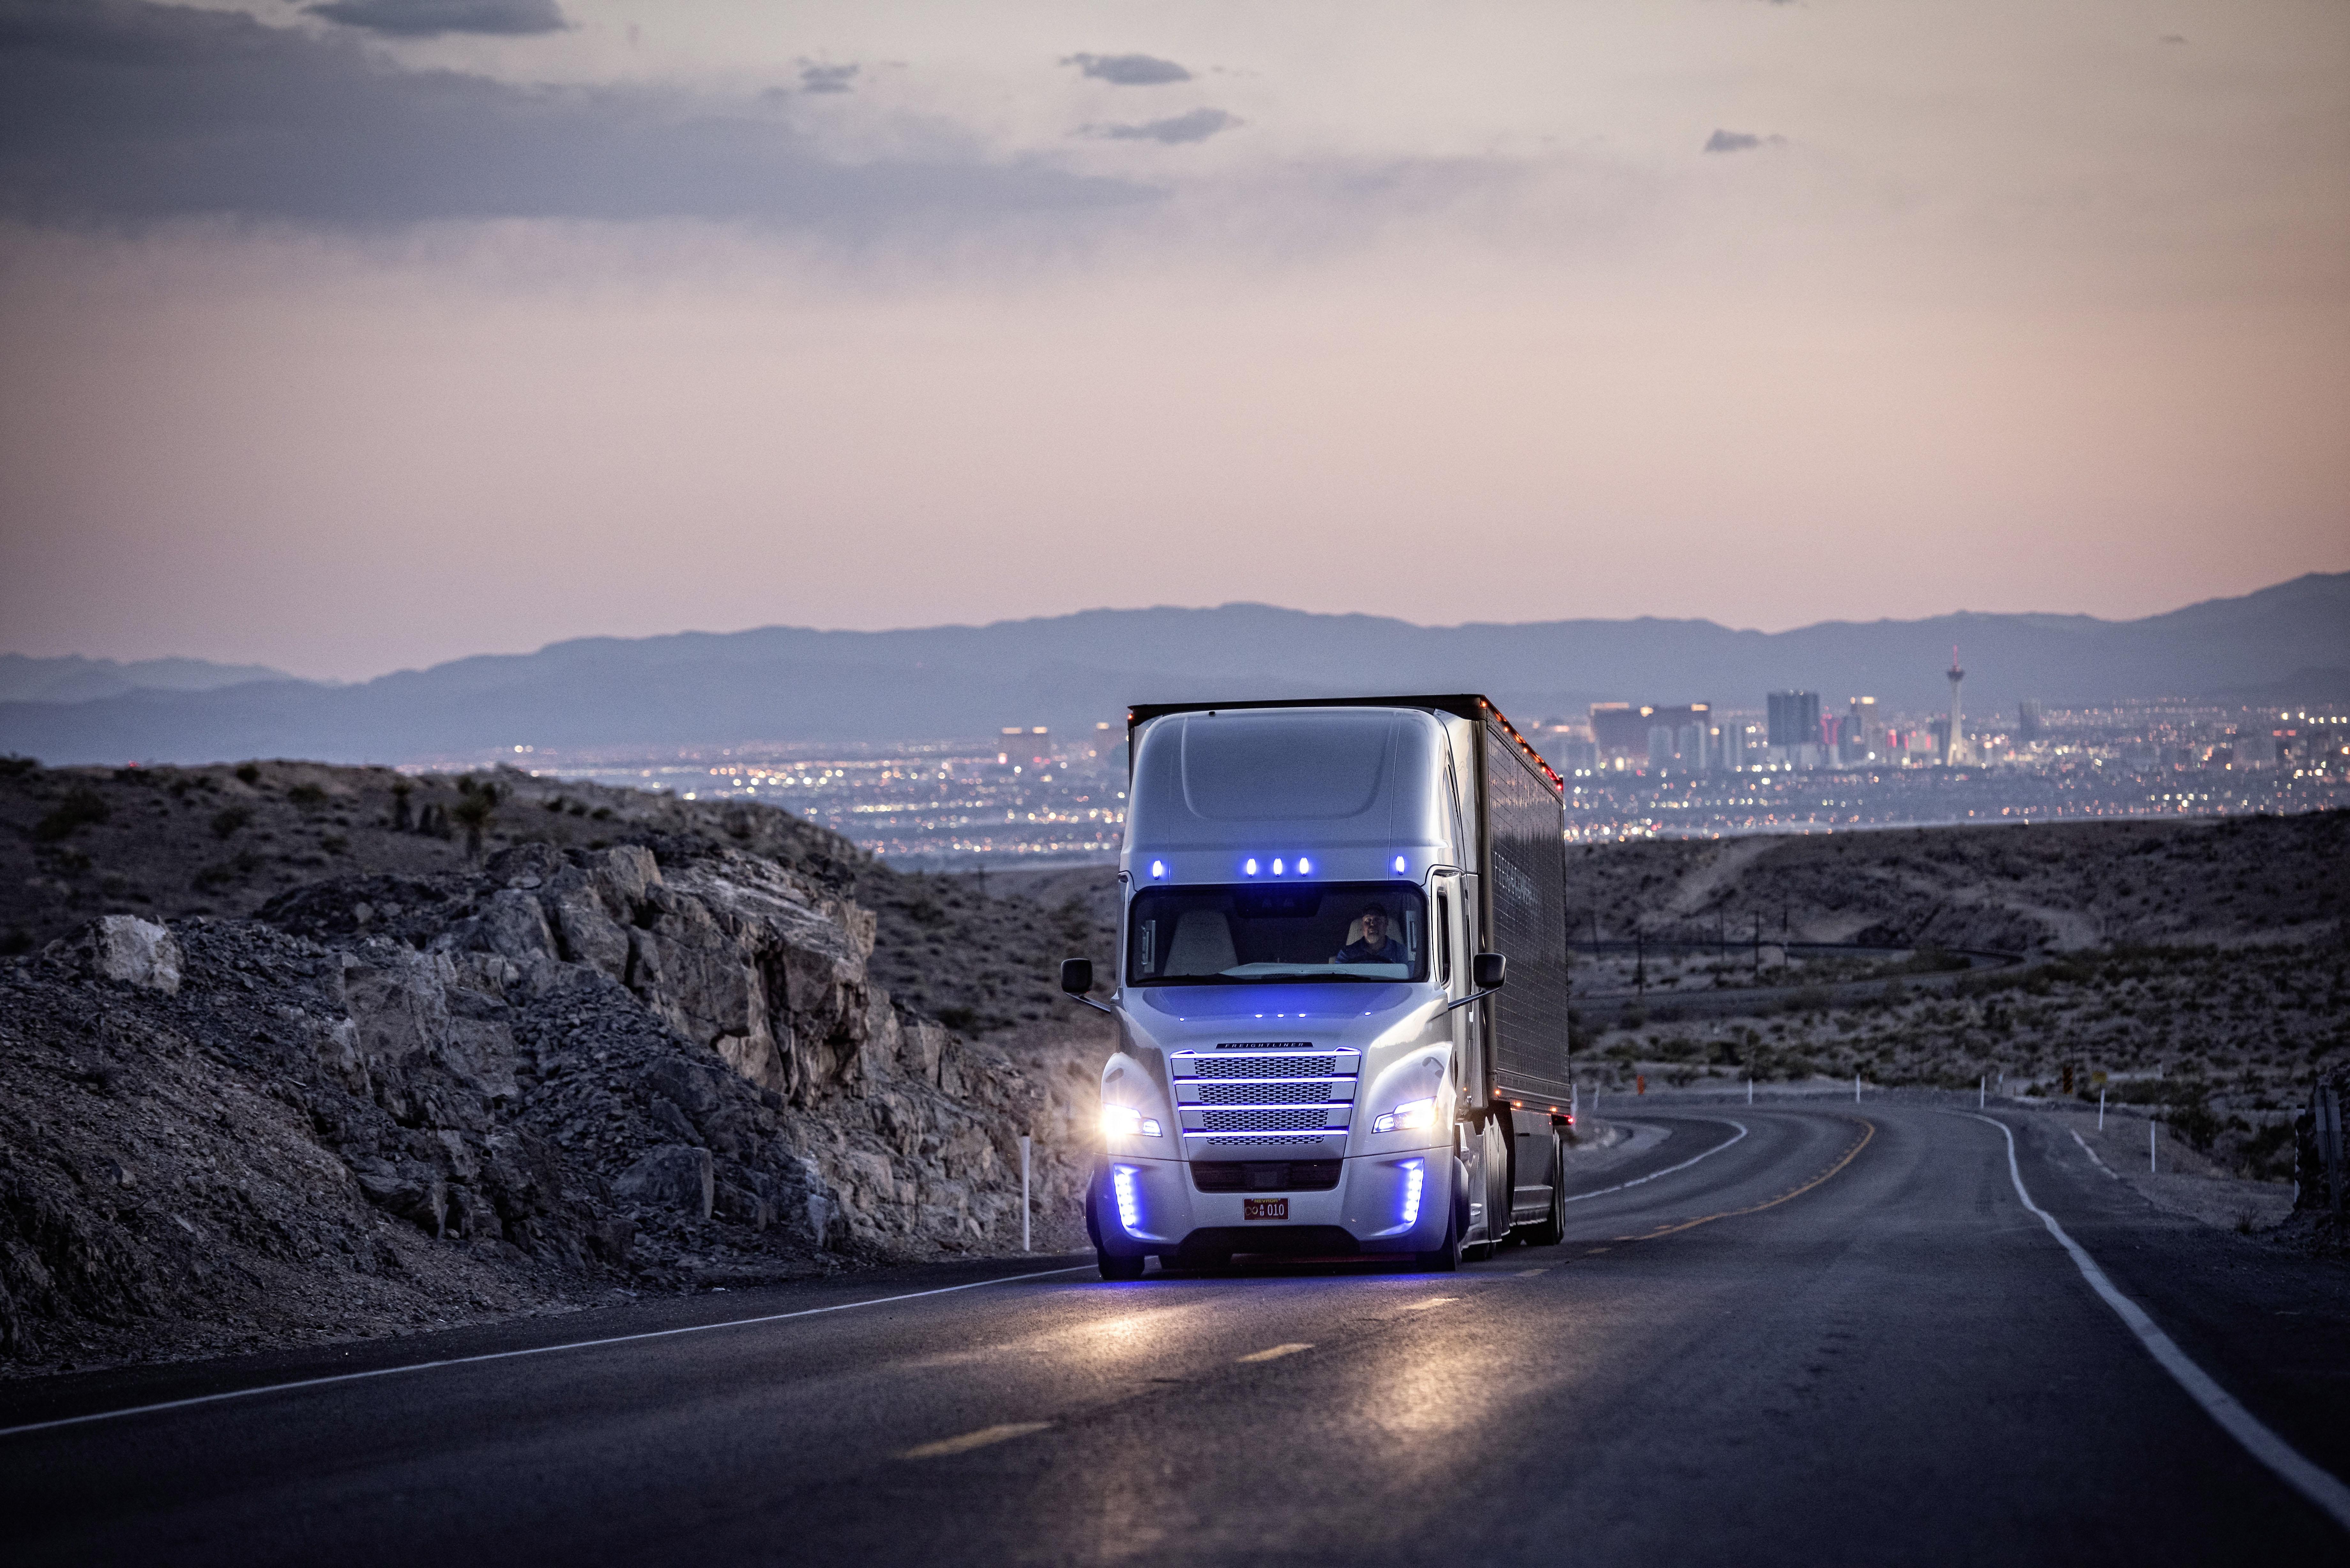 Freightliner Offers Glimpse Of Trucking Future In Prototype  U0026 39 Autonomous U0026 39  Truck